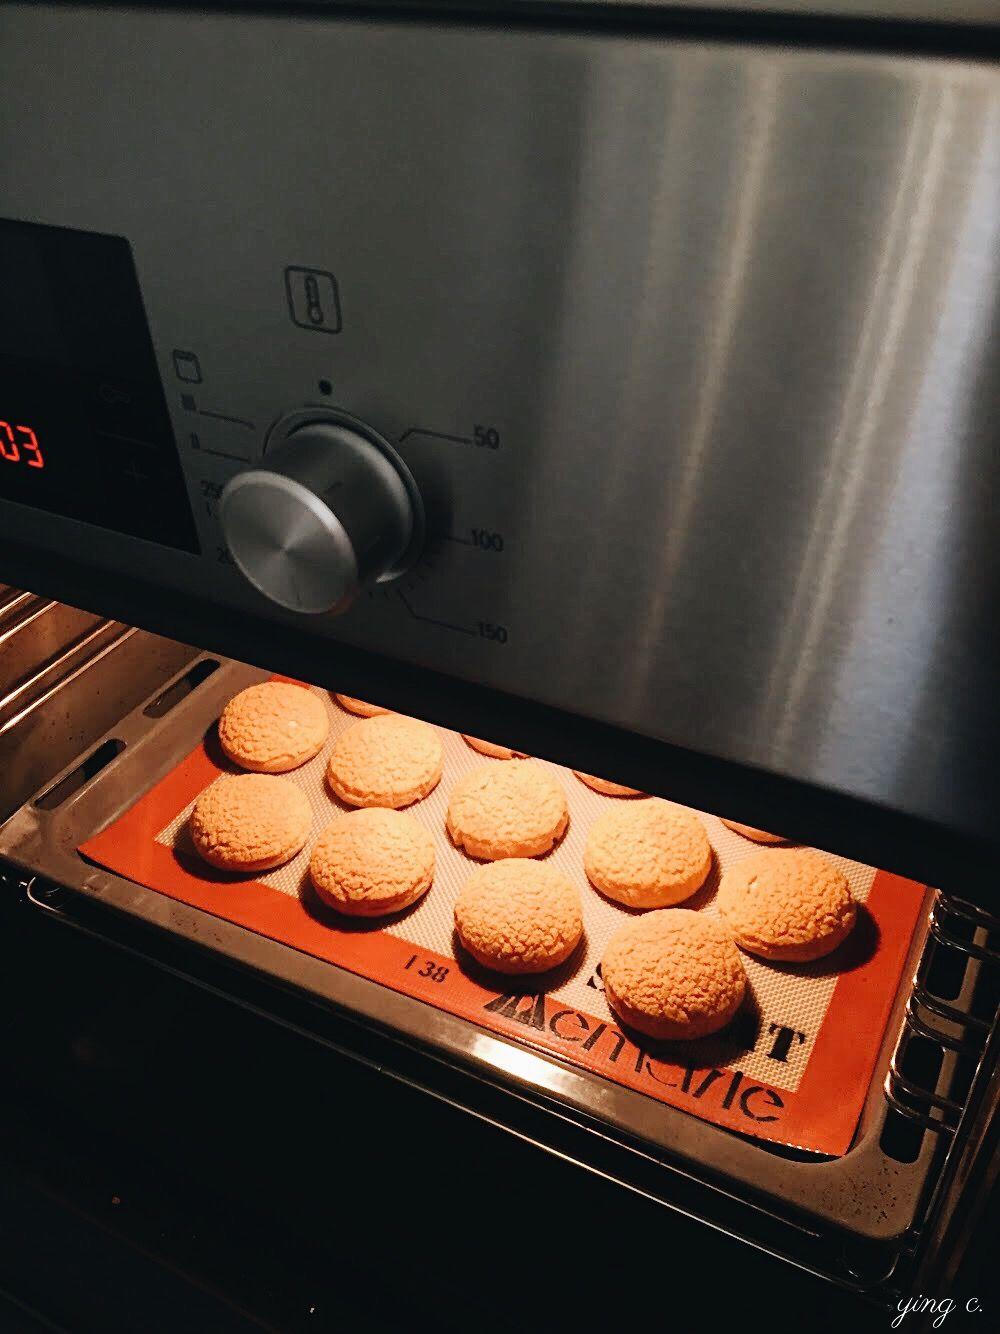 Bonheur Bonne Heure Pâtisserie by Claire L.  烤箱中即將出爐的泡芙。(攝影:Ying C.)